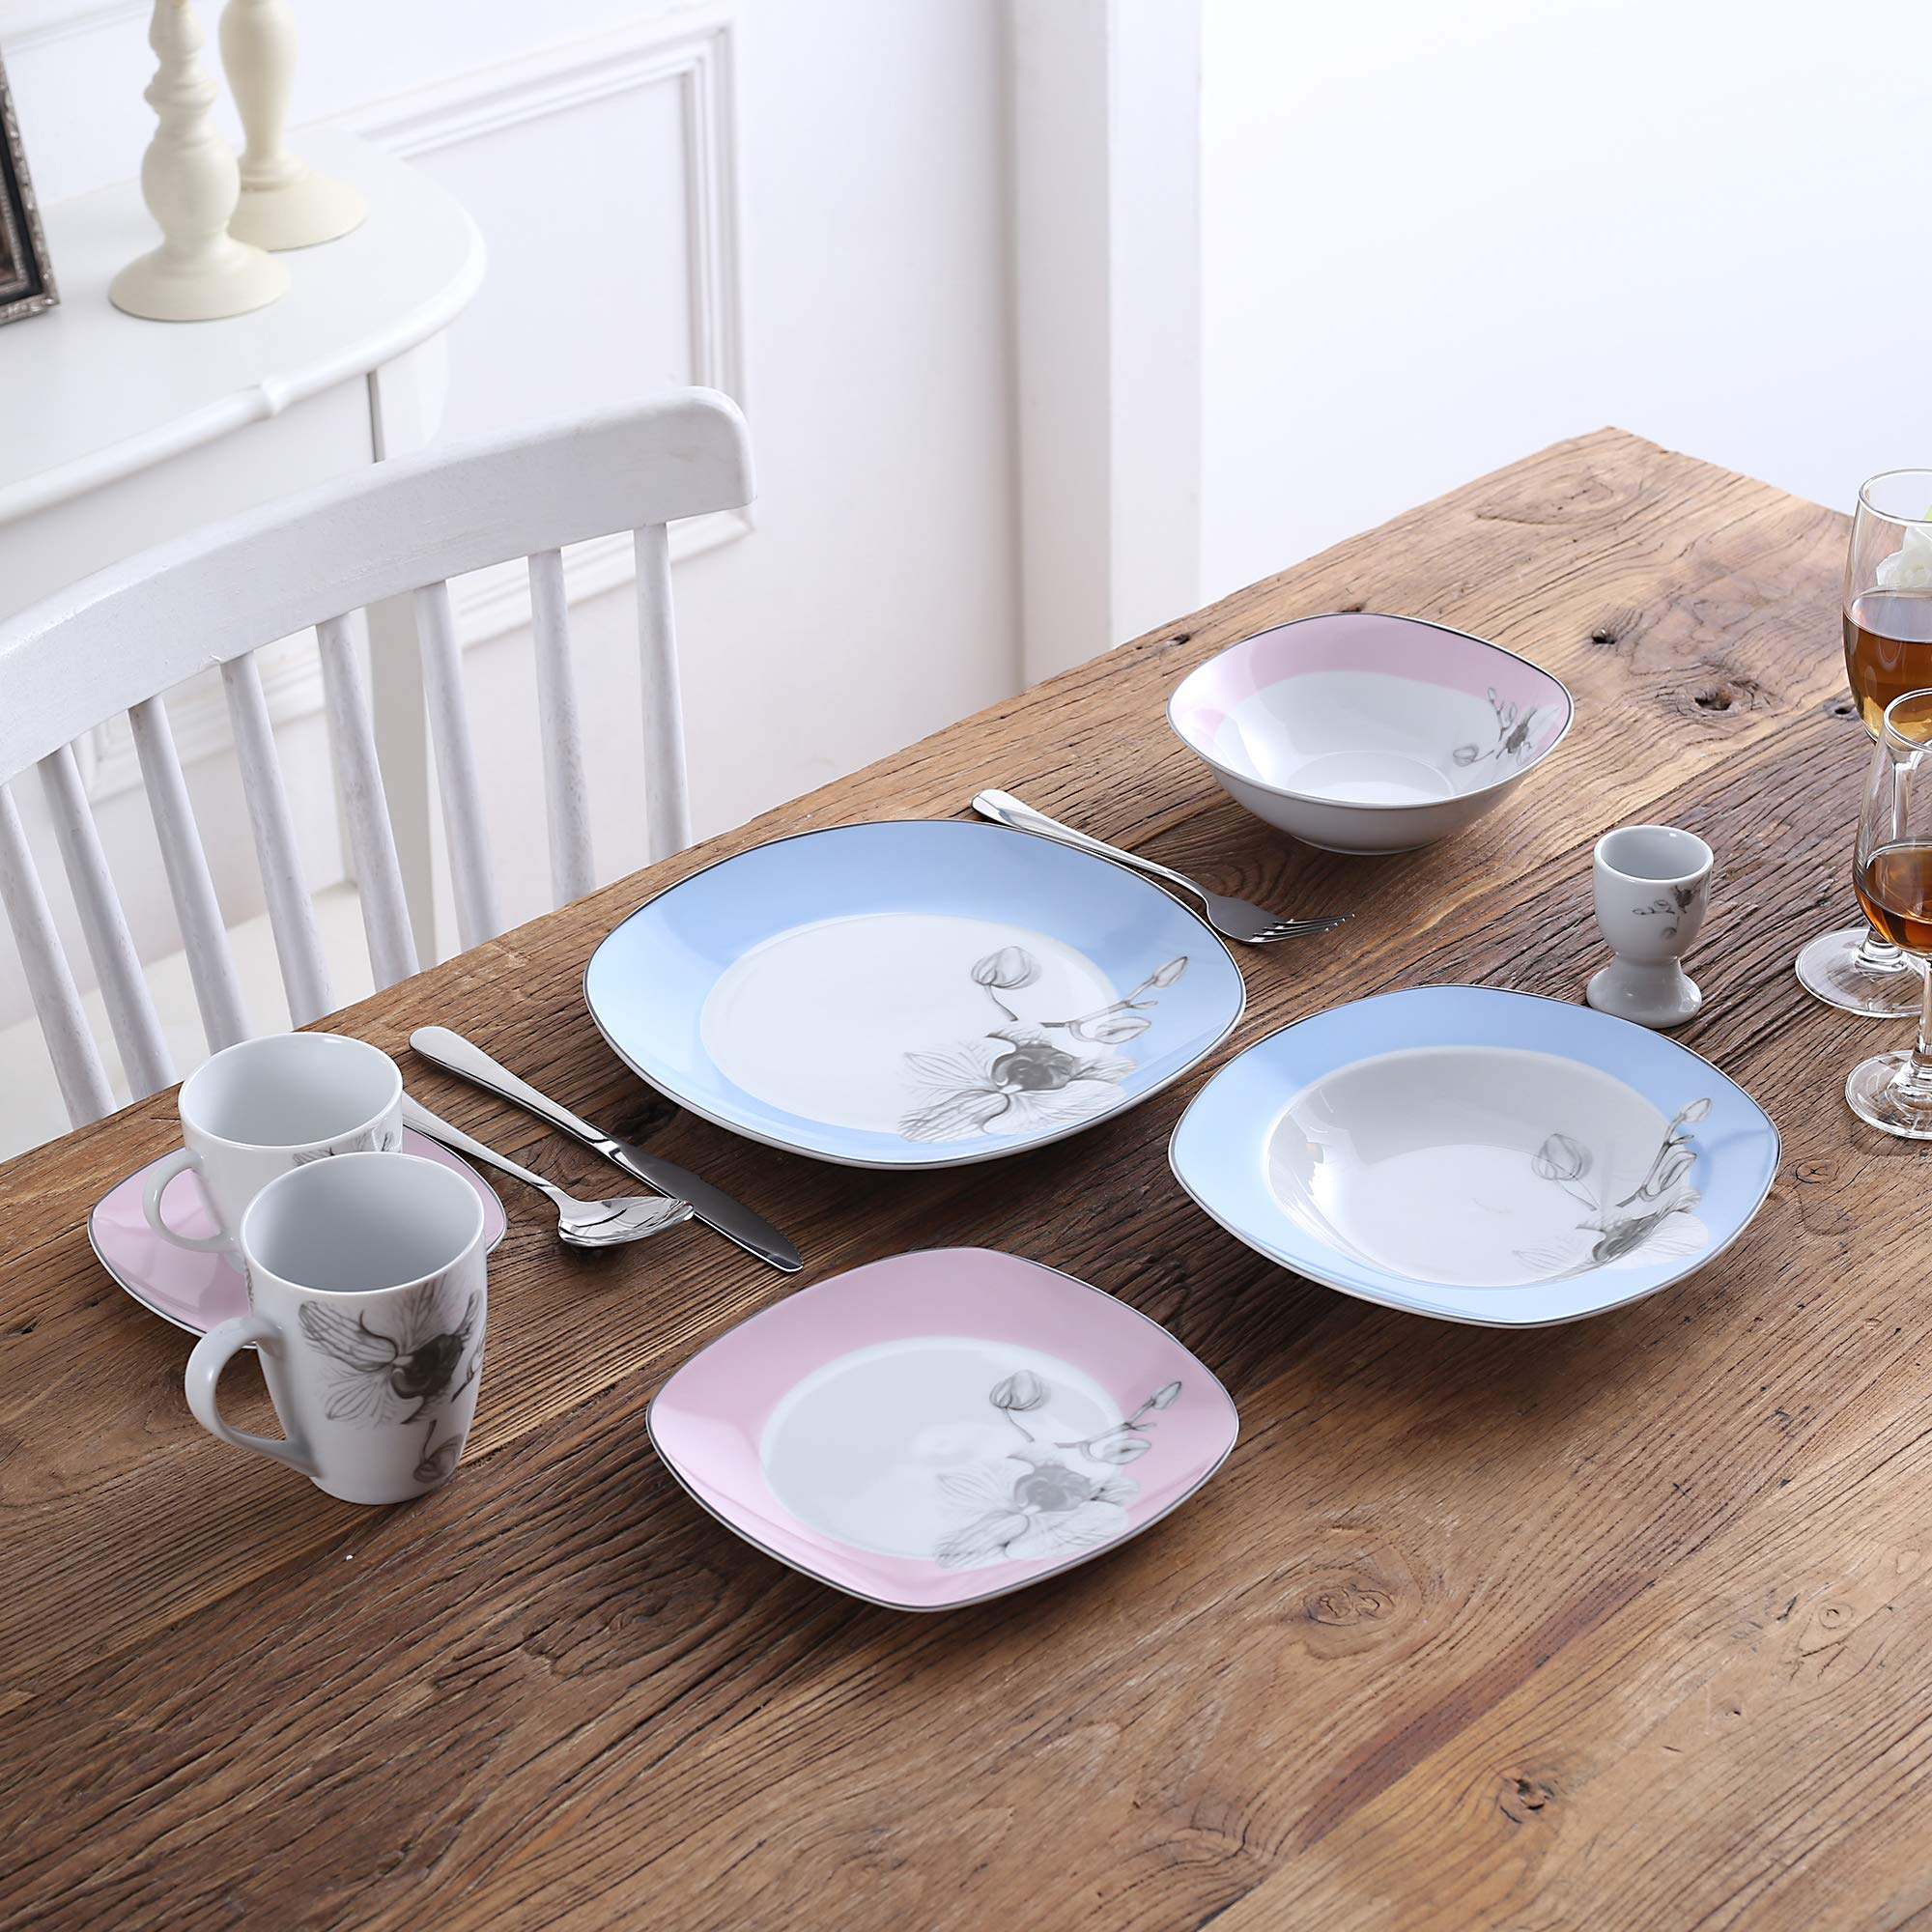 VEWEET 4-Piece Porcelain Dessert Plate Set, Durable Ivory White Bread 7-1/2 Inch Salad Plates DEBBIE Series by VEWEET (Image #6)